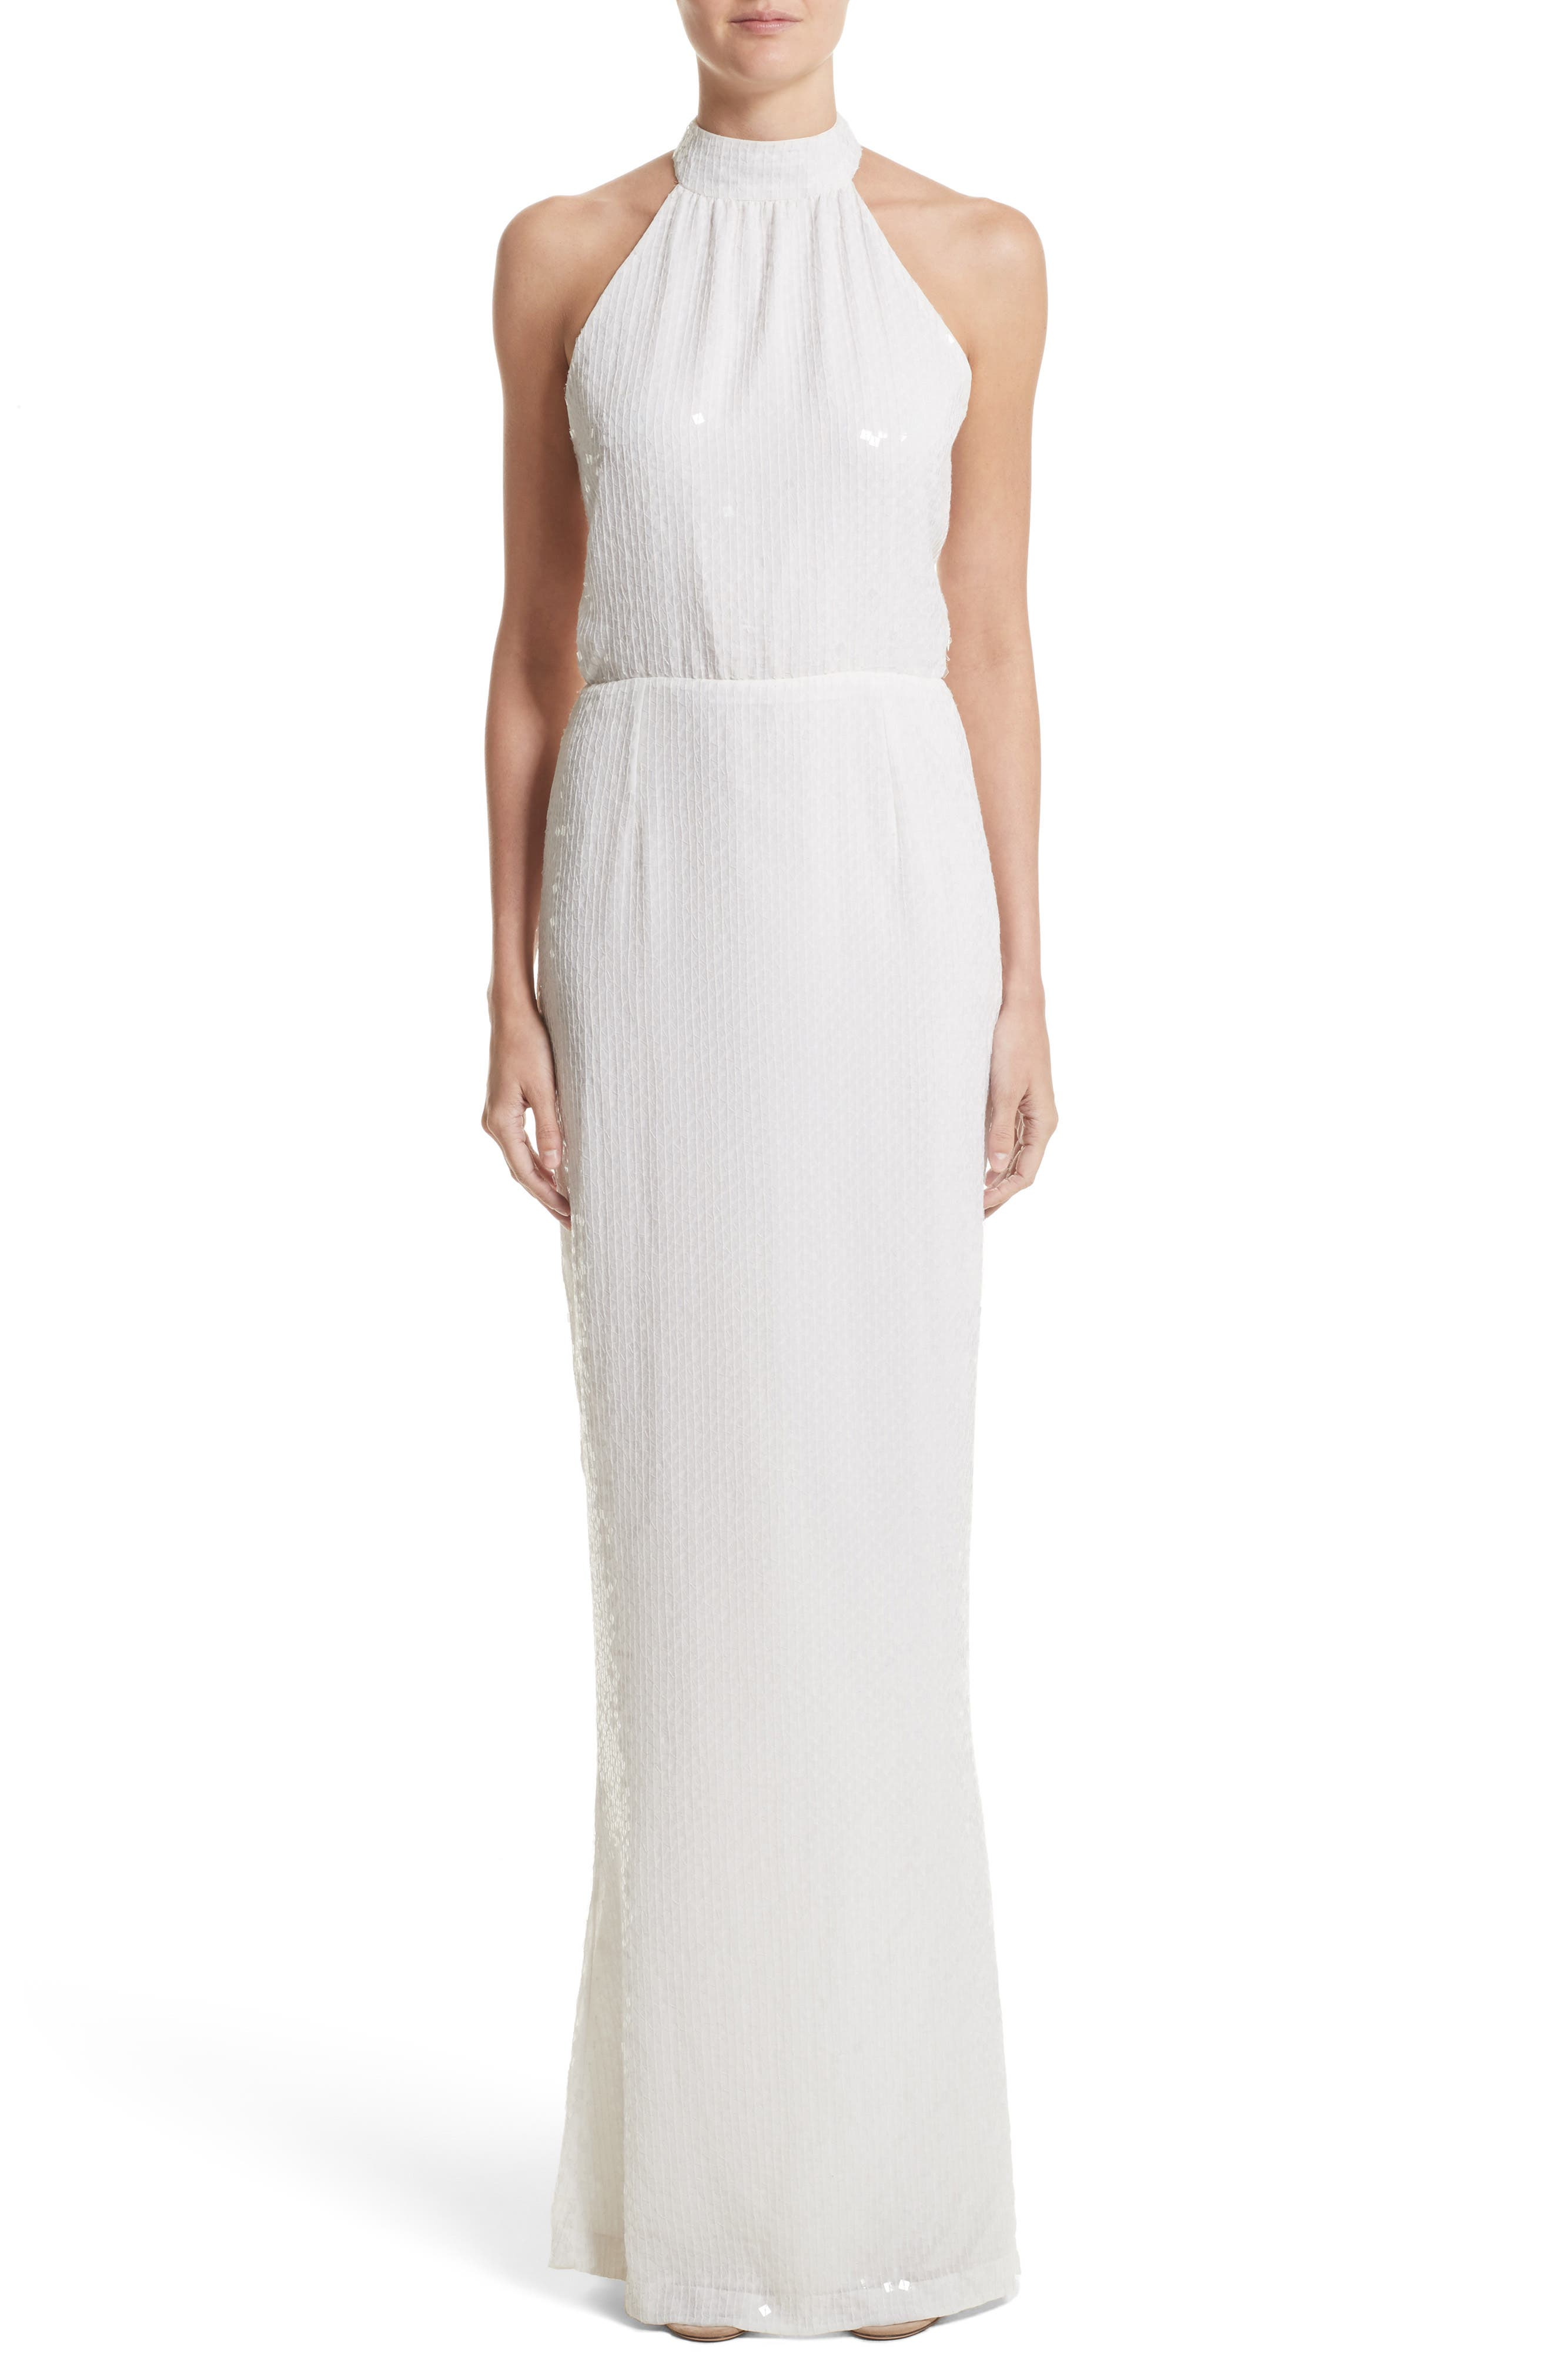 Rachel Gilbert Inga Sequin Halter Style Column Gown